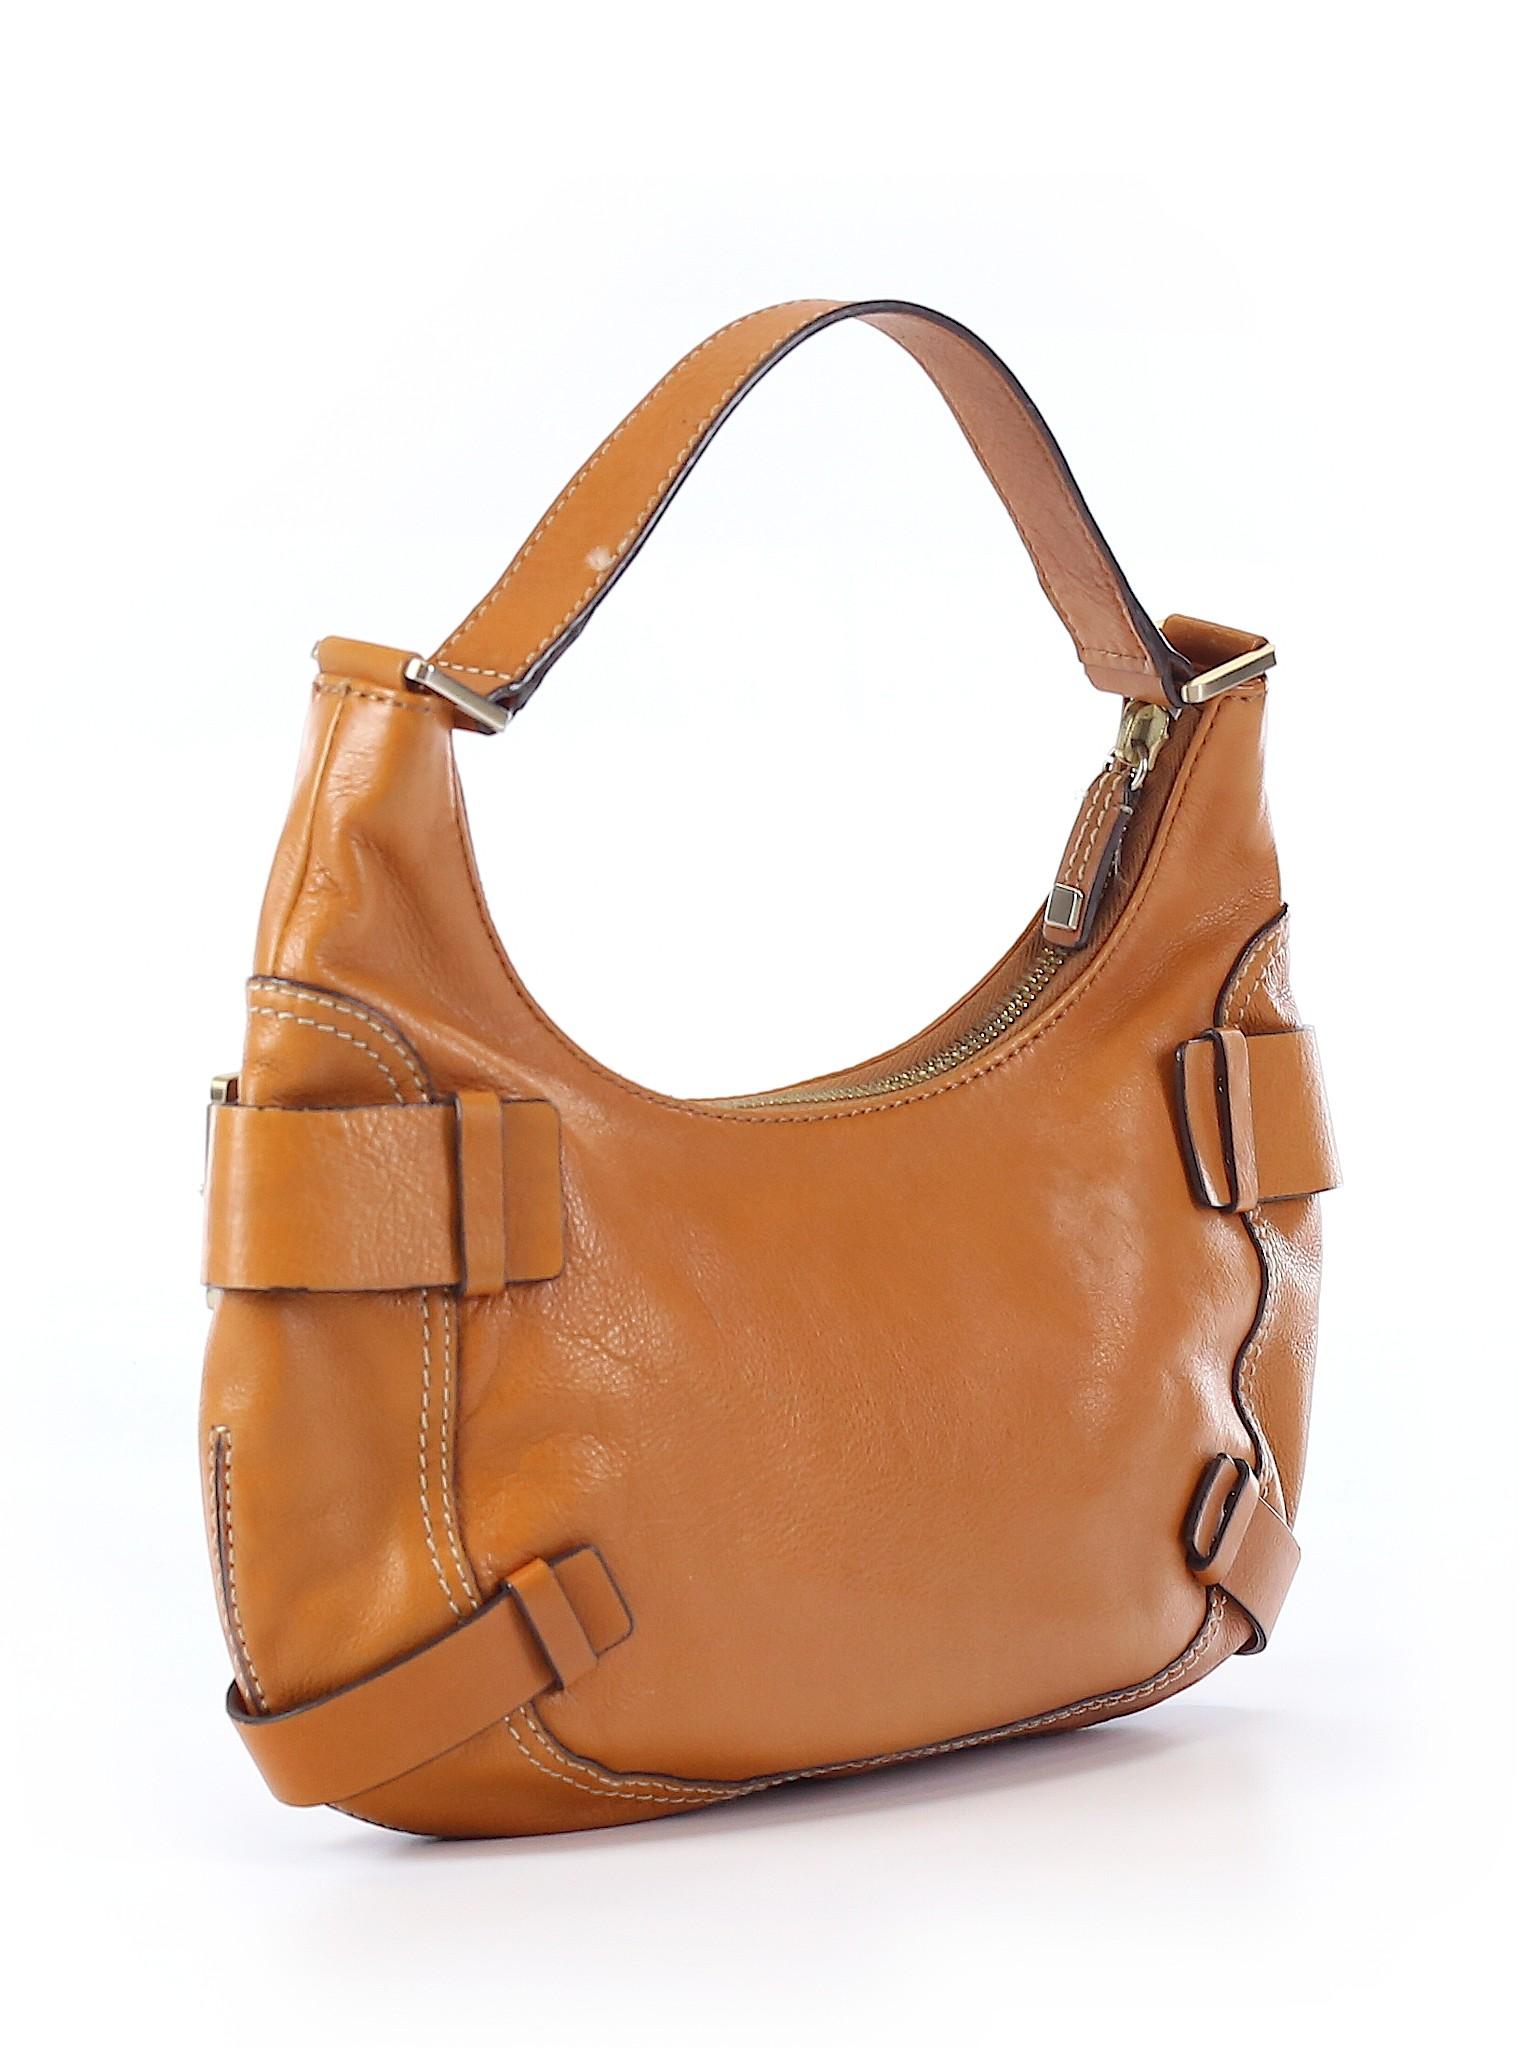 c83c0103e3e Handbags  Shoulder Bags Orange On Sale Up To 90% Off Retail   thredUP